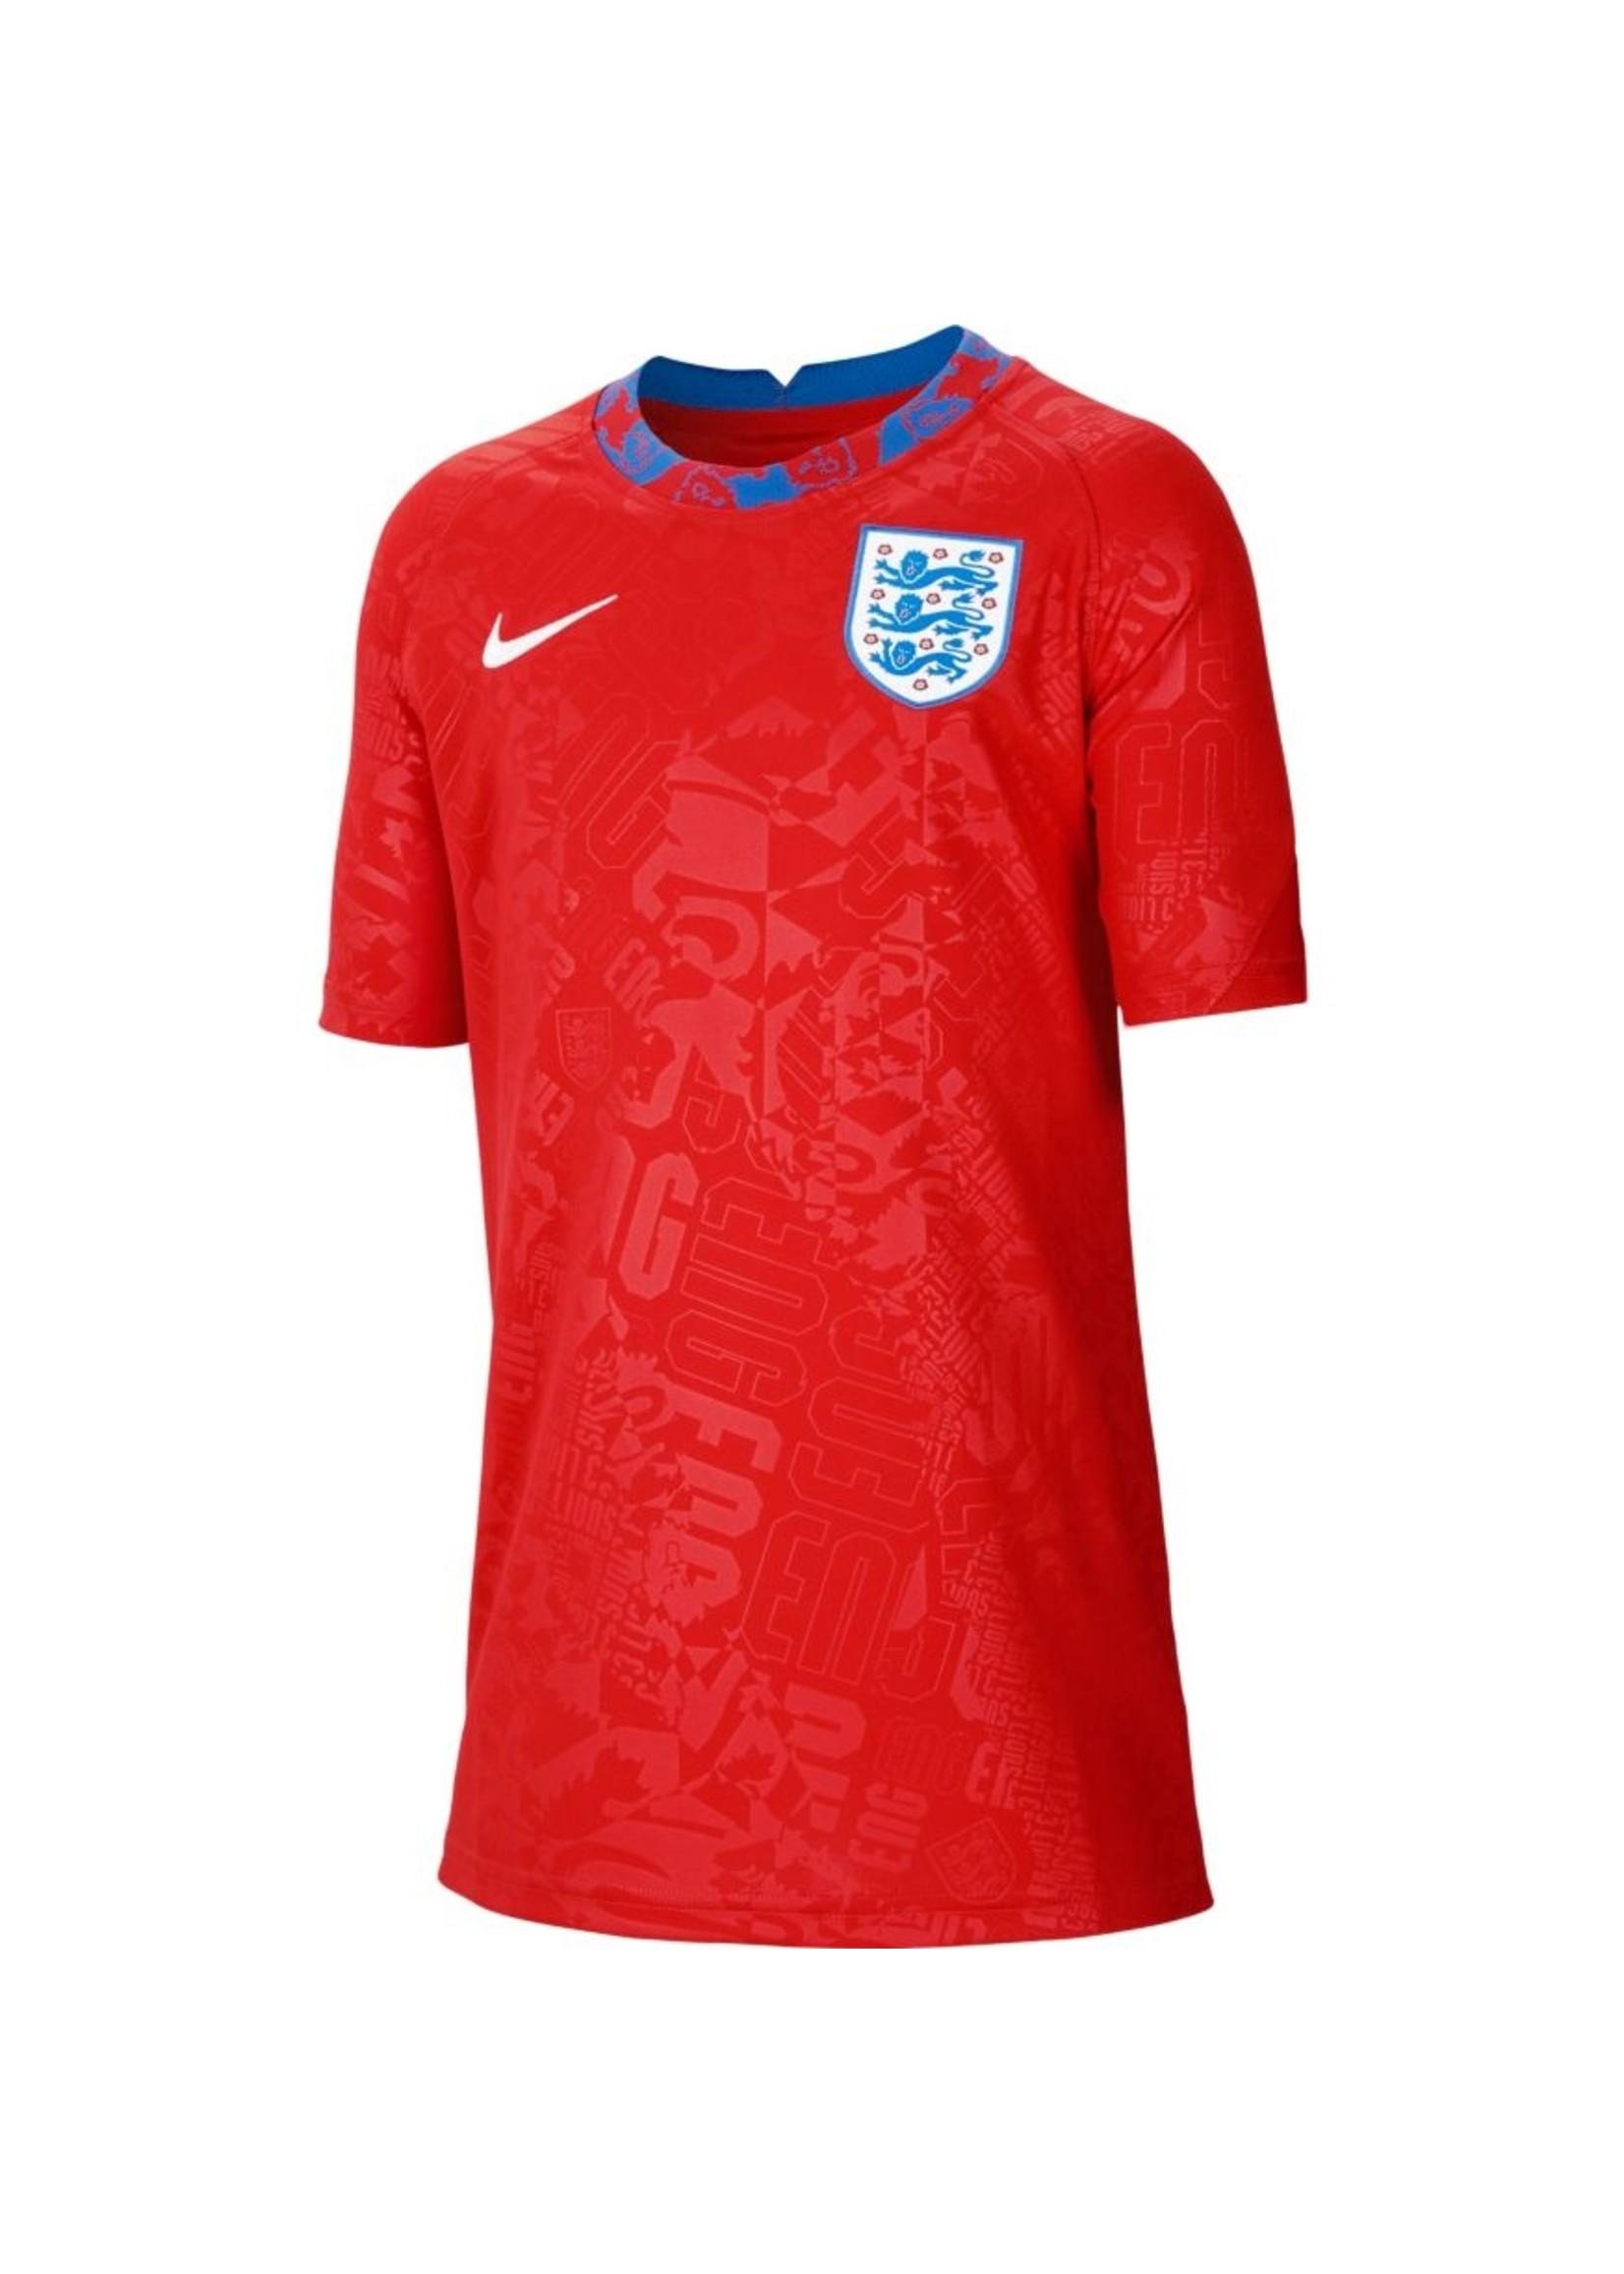 Nike England 20/21 Training Jersey Youth